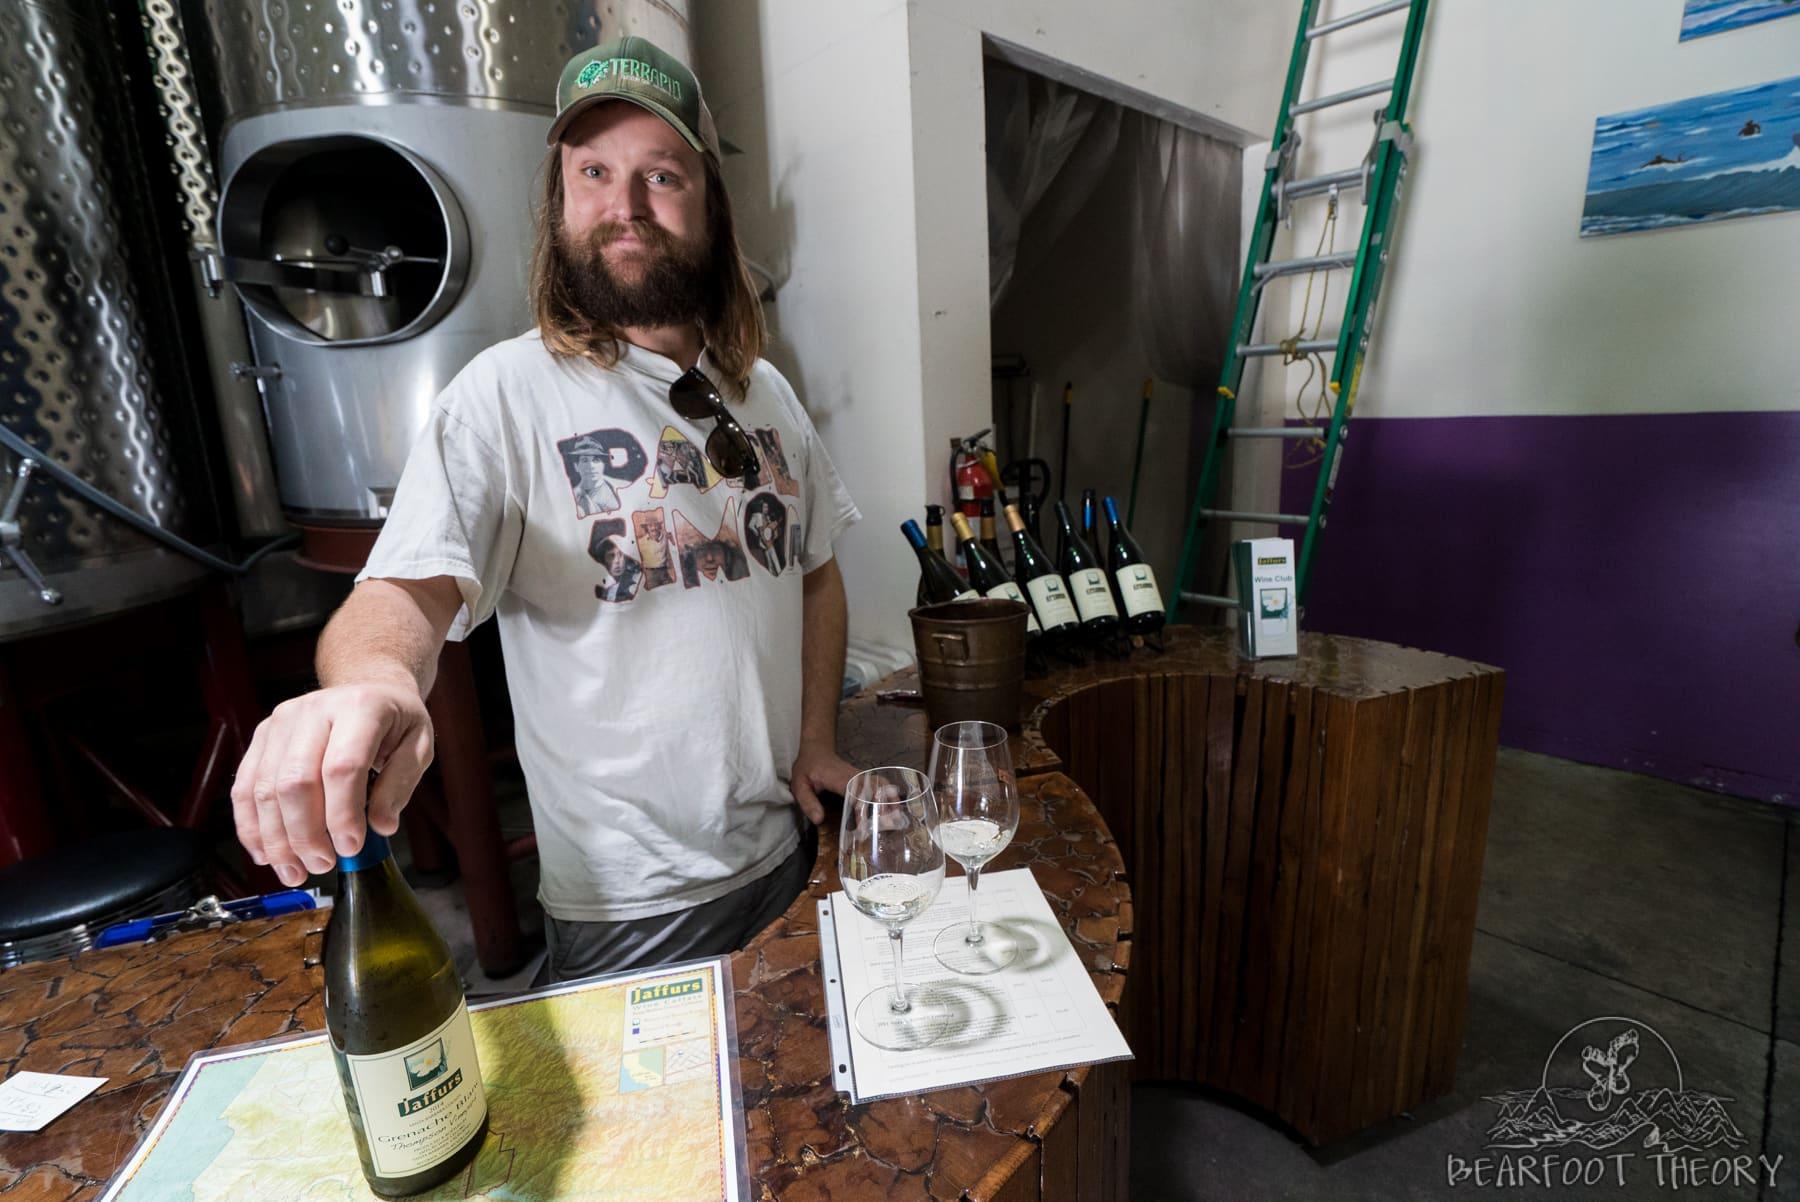 Matt Brady - The winemaker at Jaffurs Winery - One of my favorite stops on Santa Barbara's wine trail